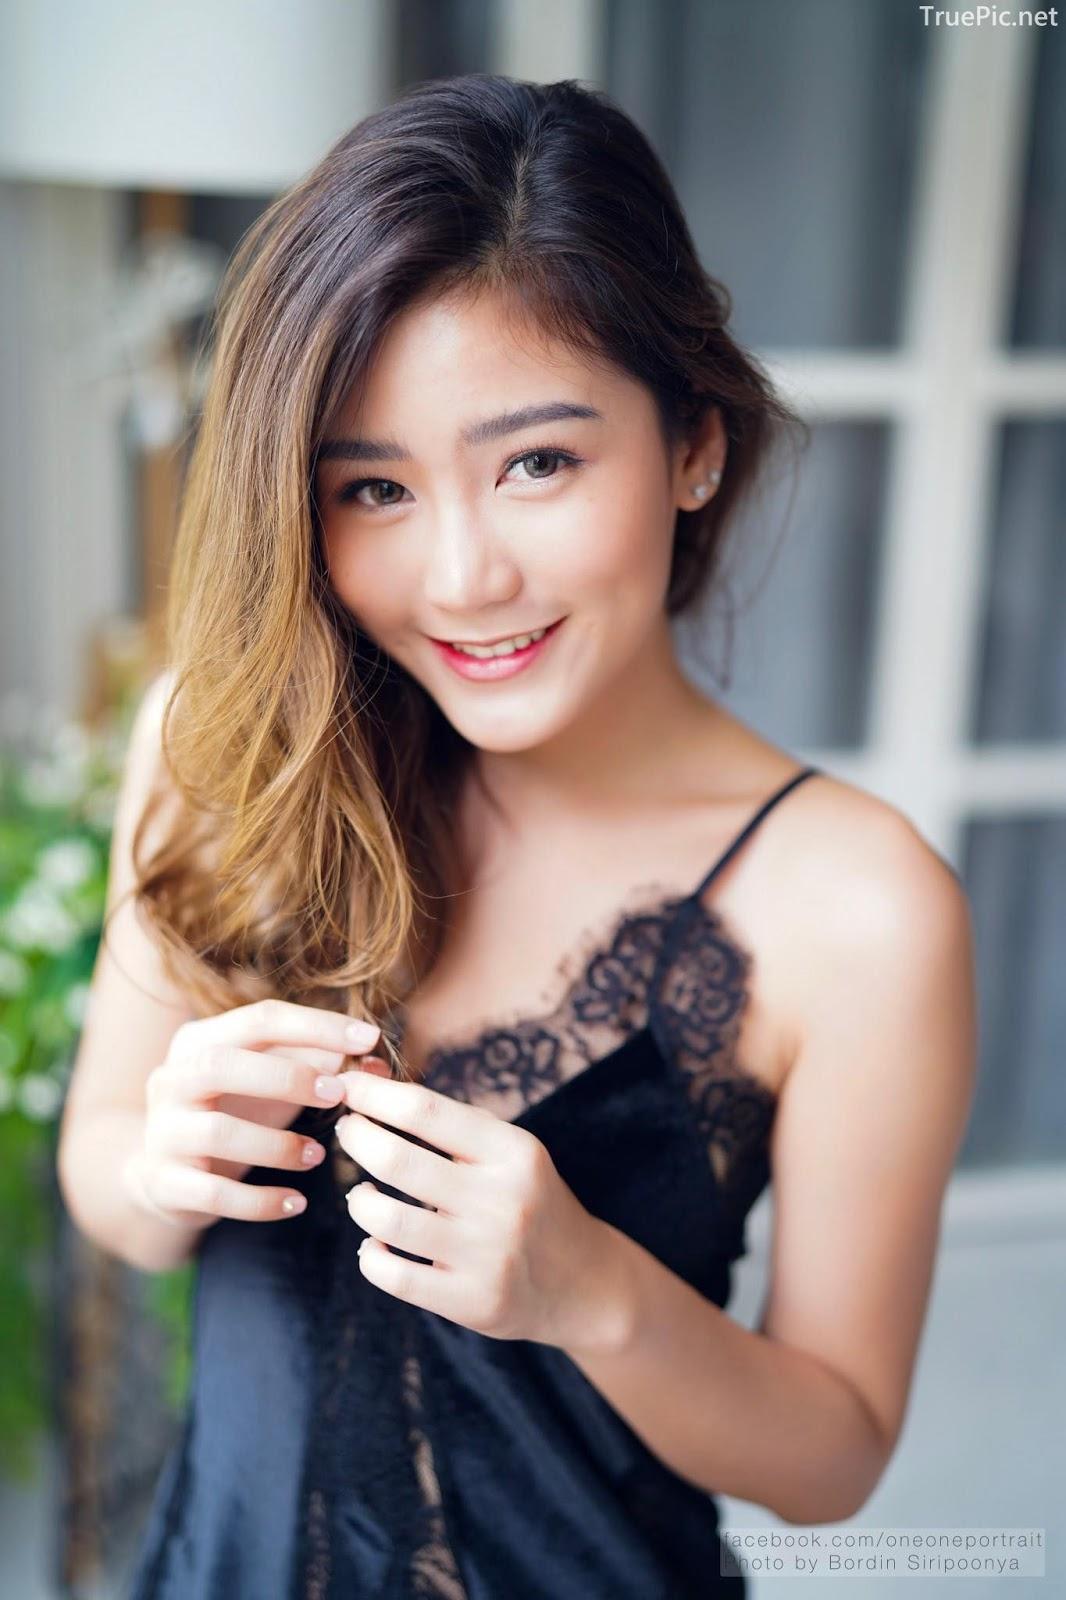 Thailand hot model Pattaravadee Boonmeesup vs Photo album Black Magic Sleepwear - Picture 10